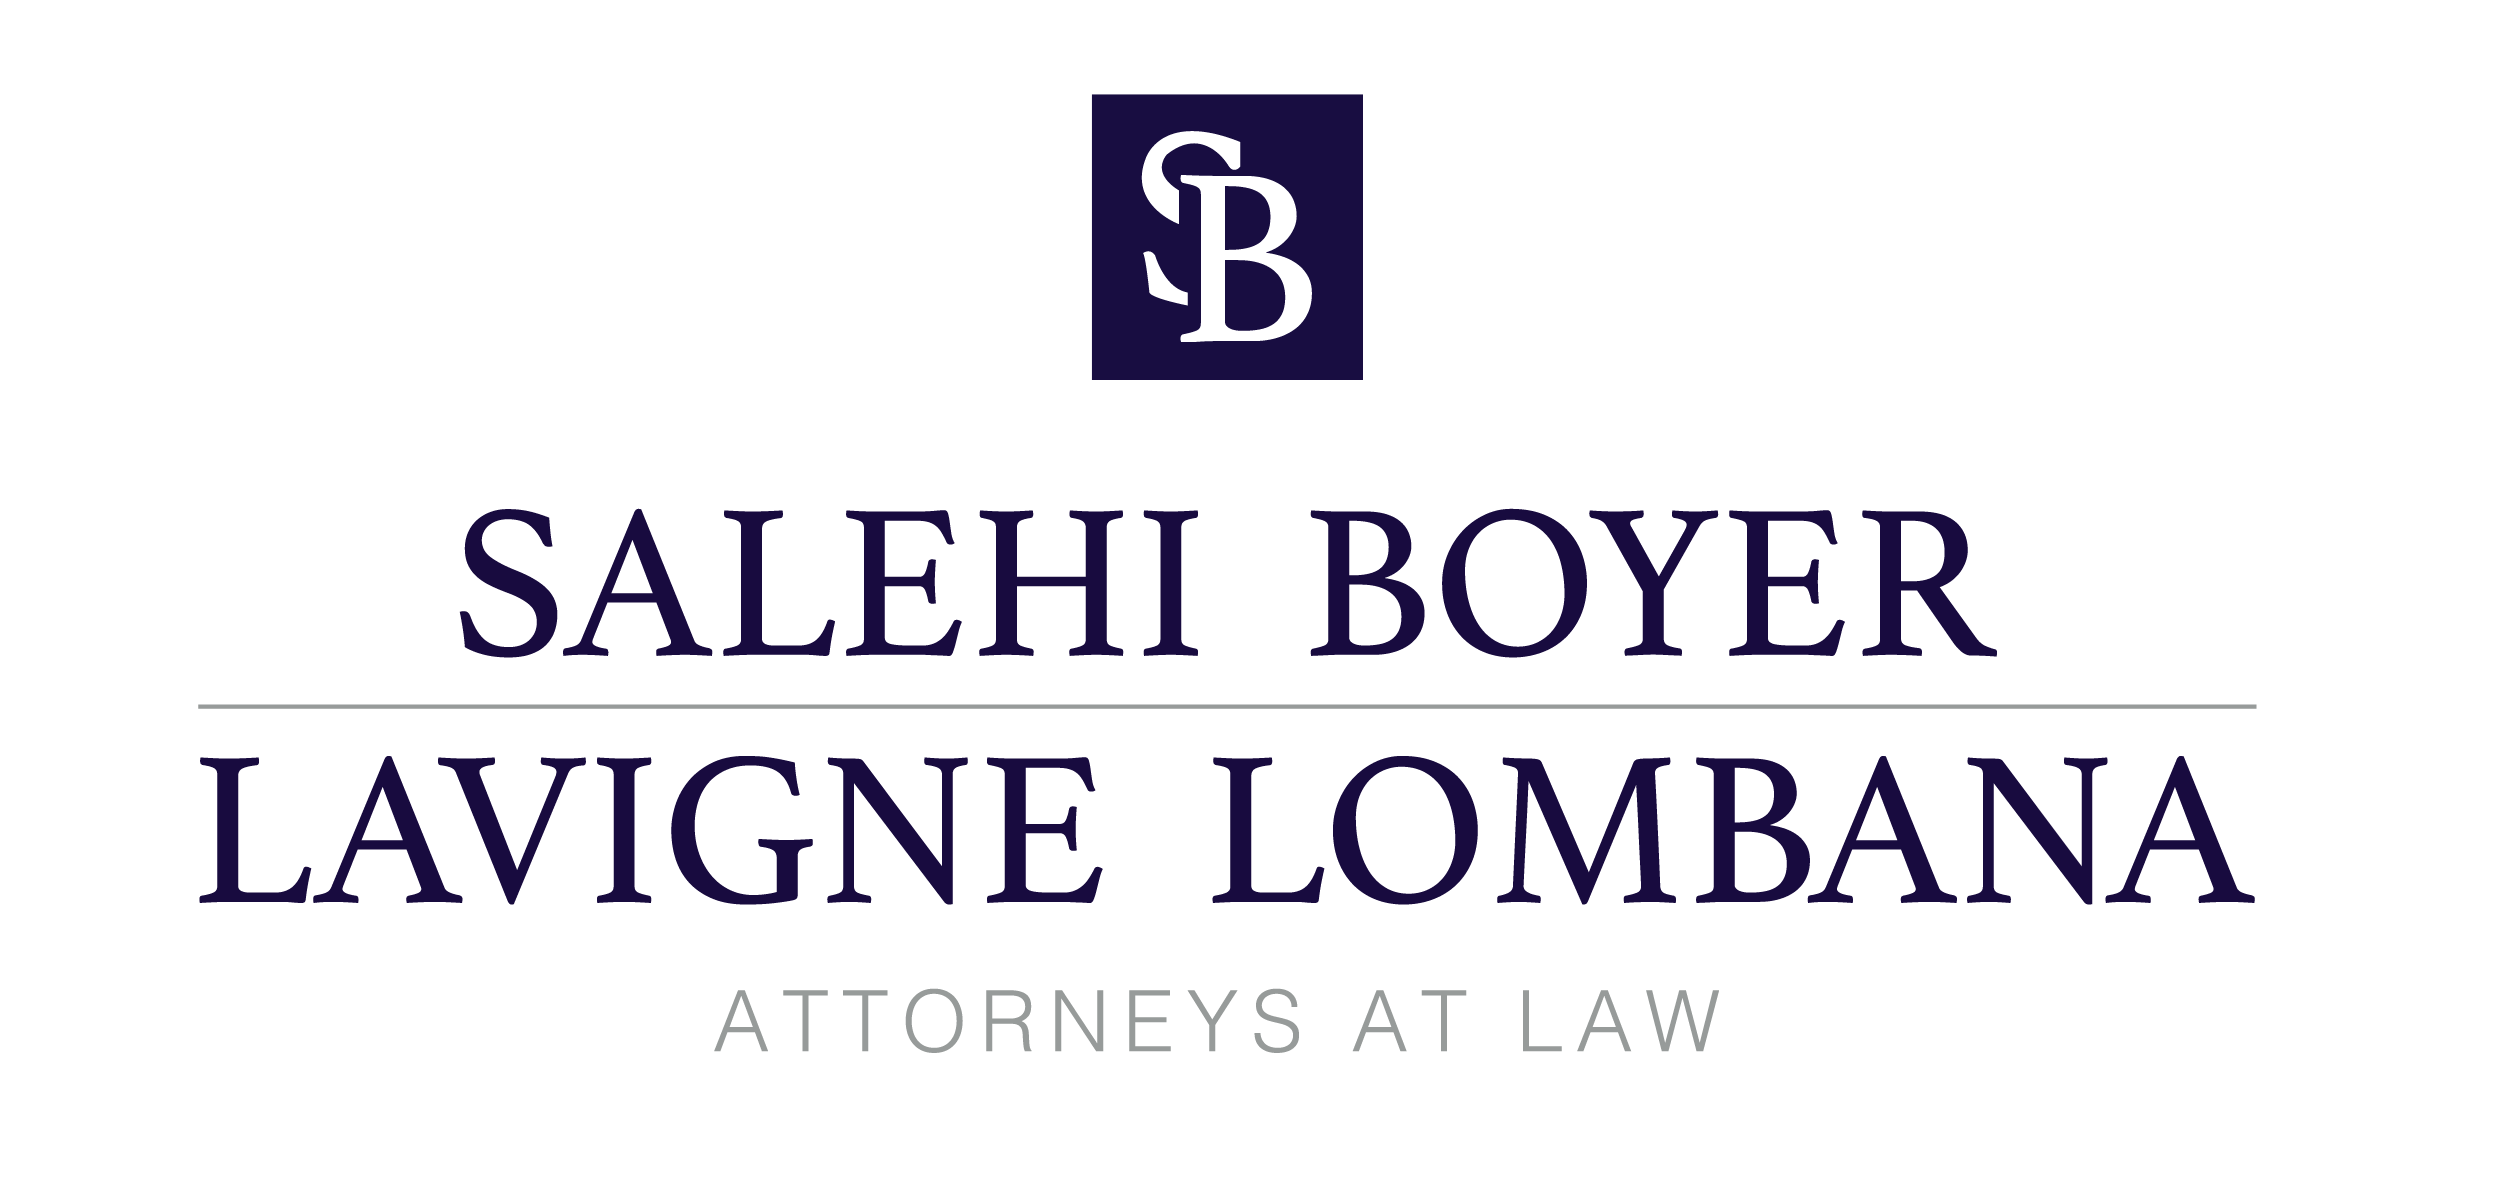 Salehi Boyer Lavigne Lombana